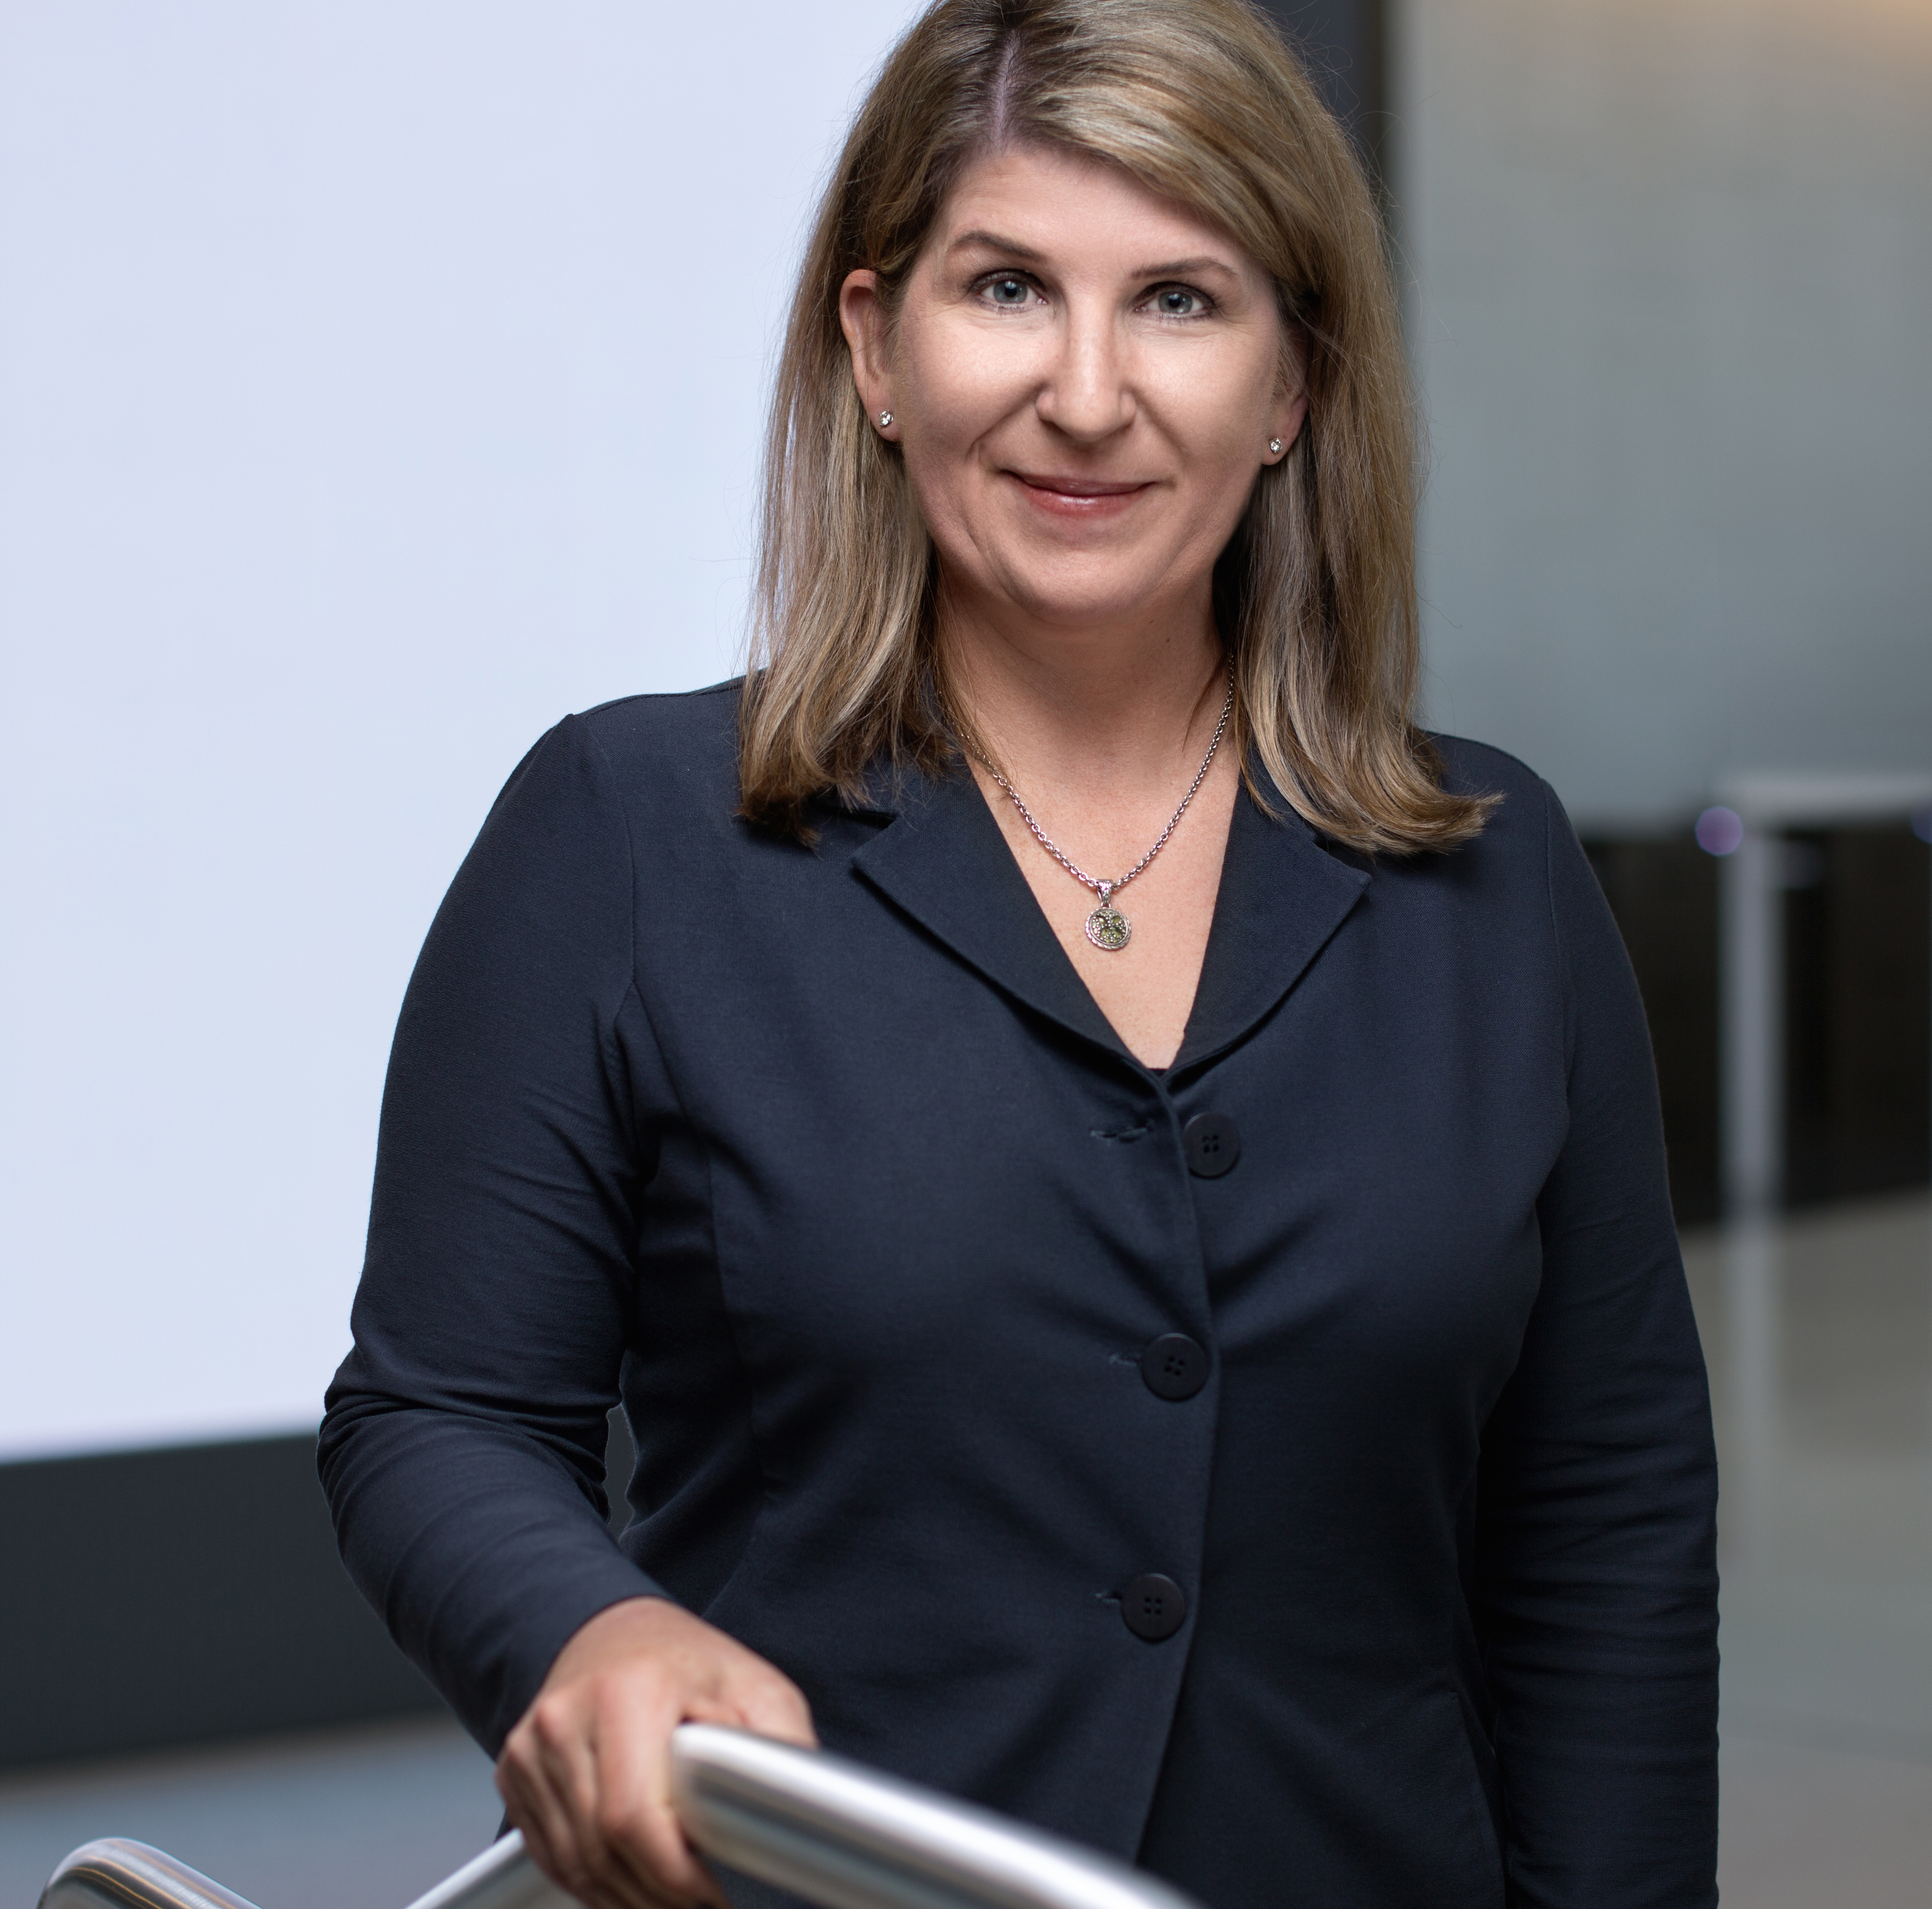 Lauren Sallata